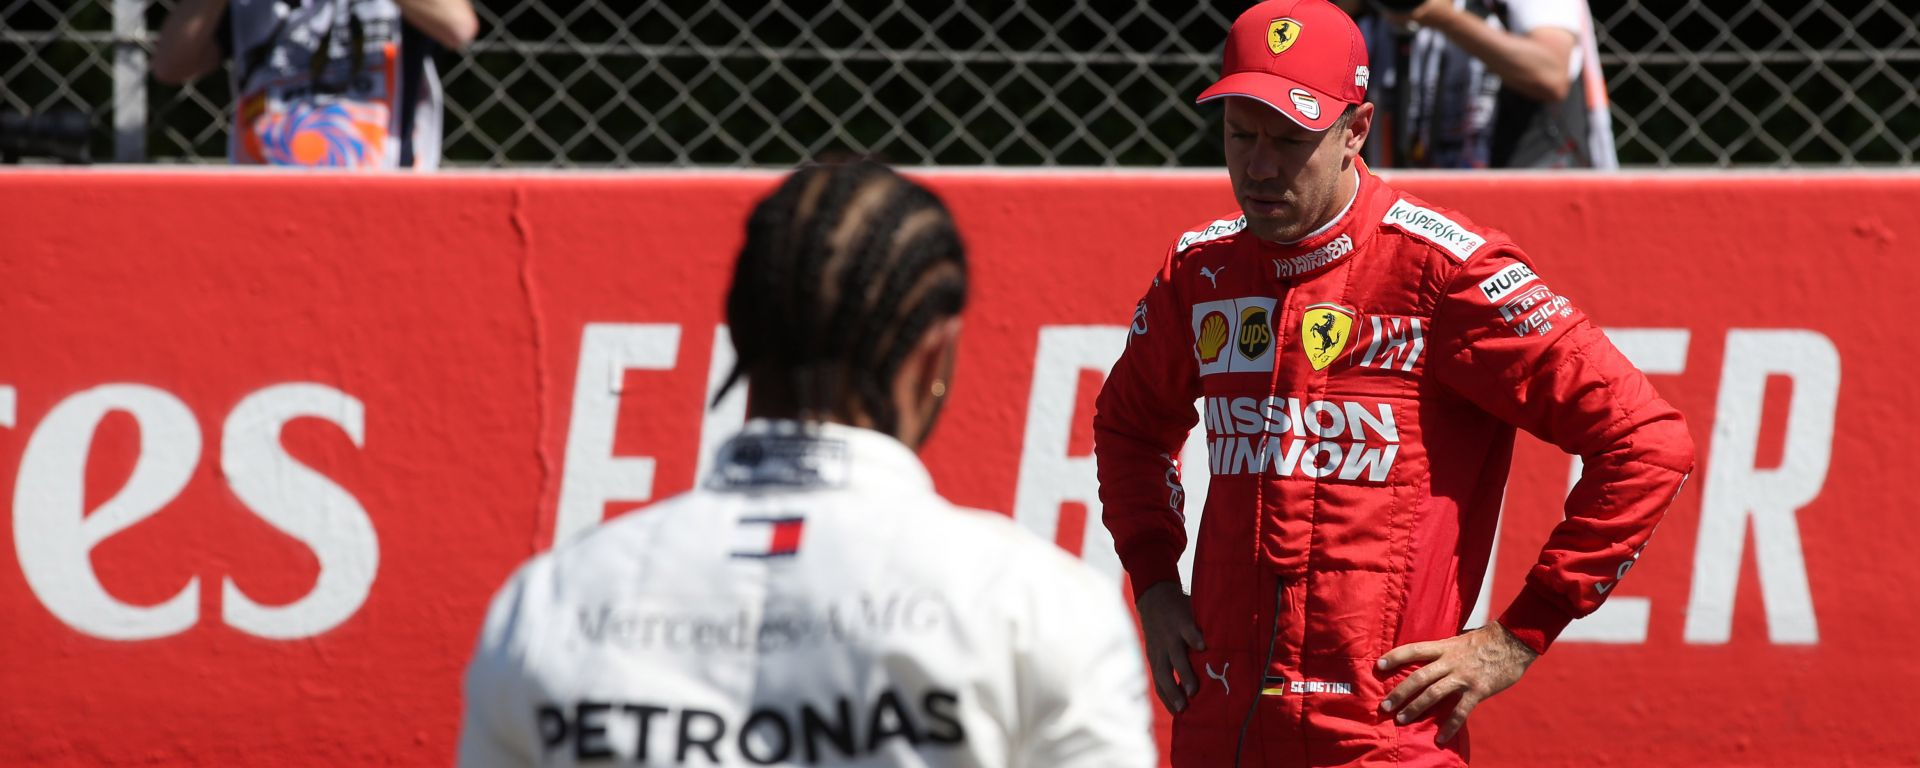 Ferrari & Mercedes: talloni d'achille e piedi da killer